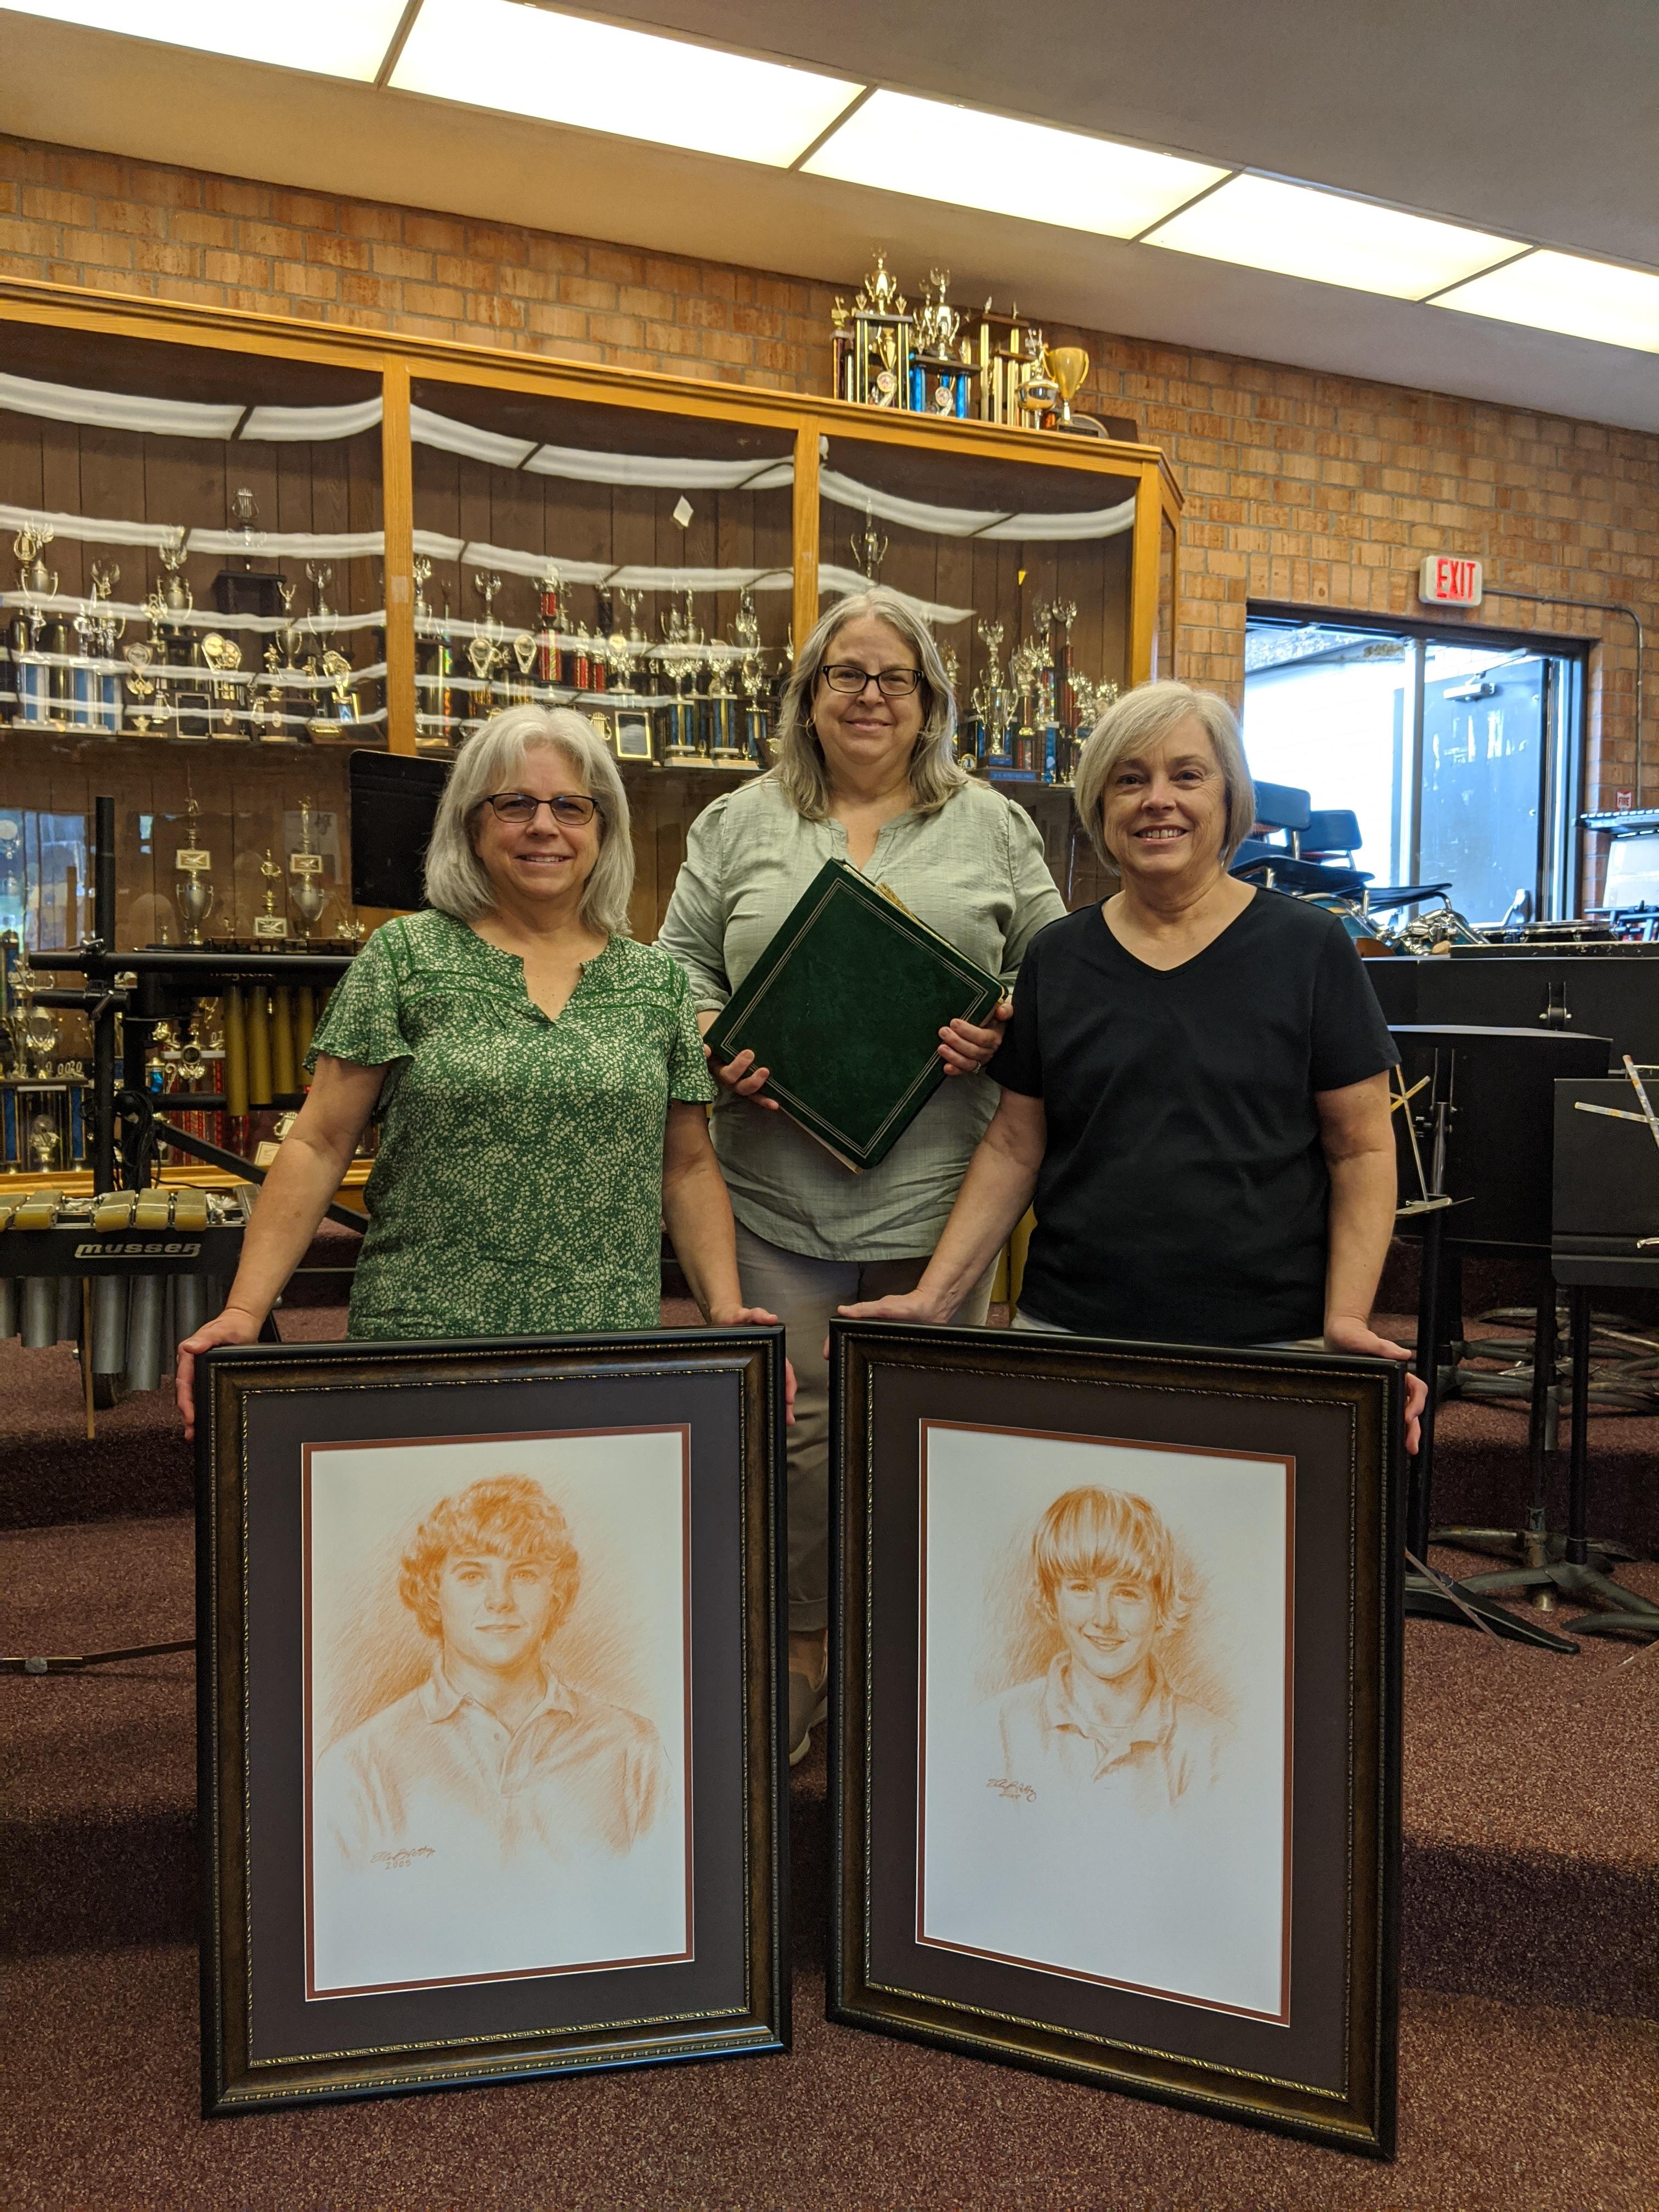 Jan Pennington, Patti Freemon and Pam Phillips share portraits of Bill and Mickey Bunn.